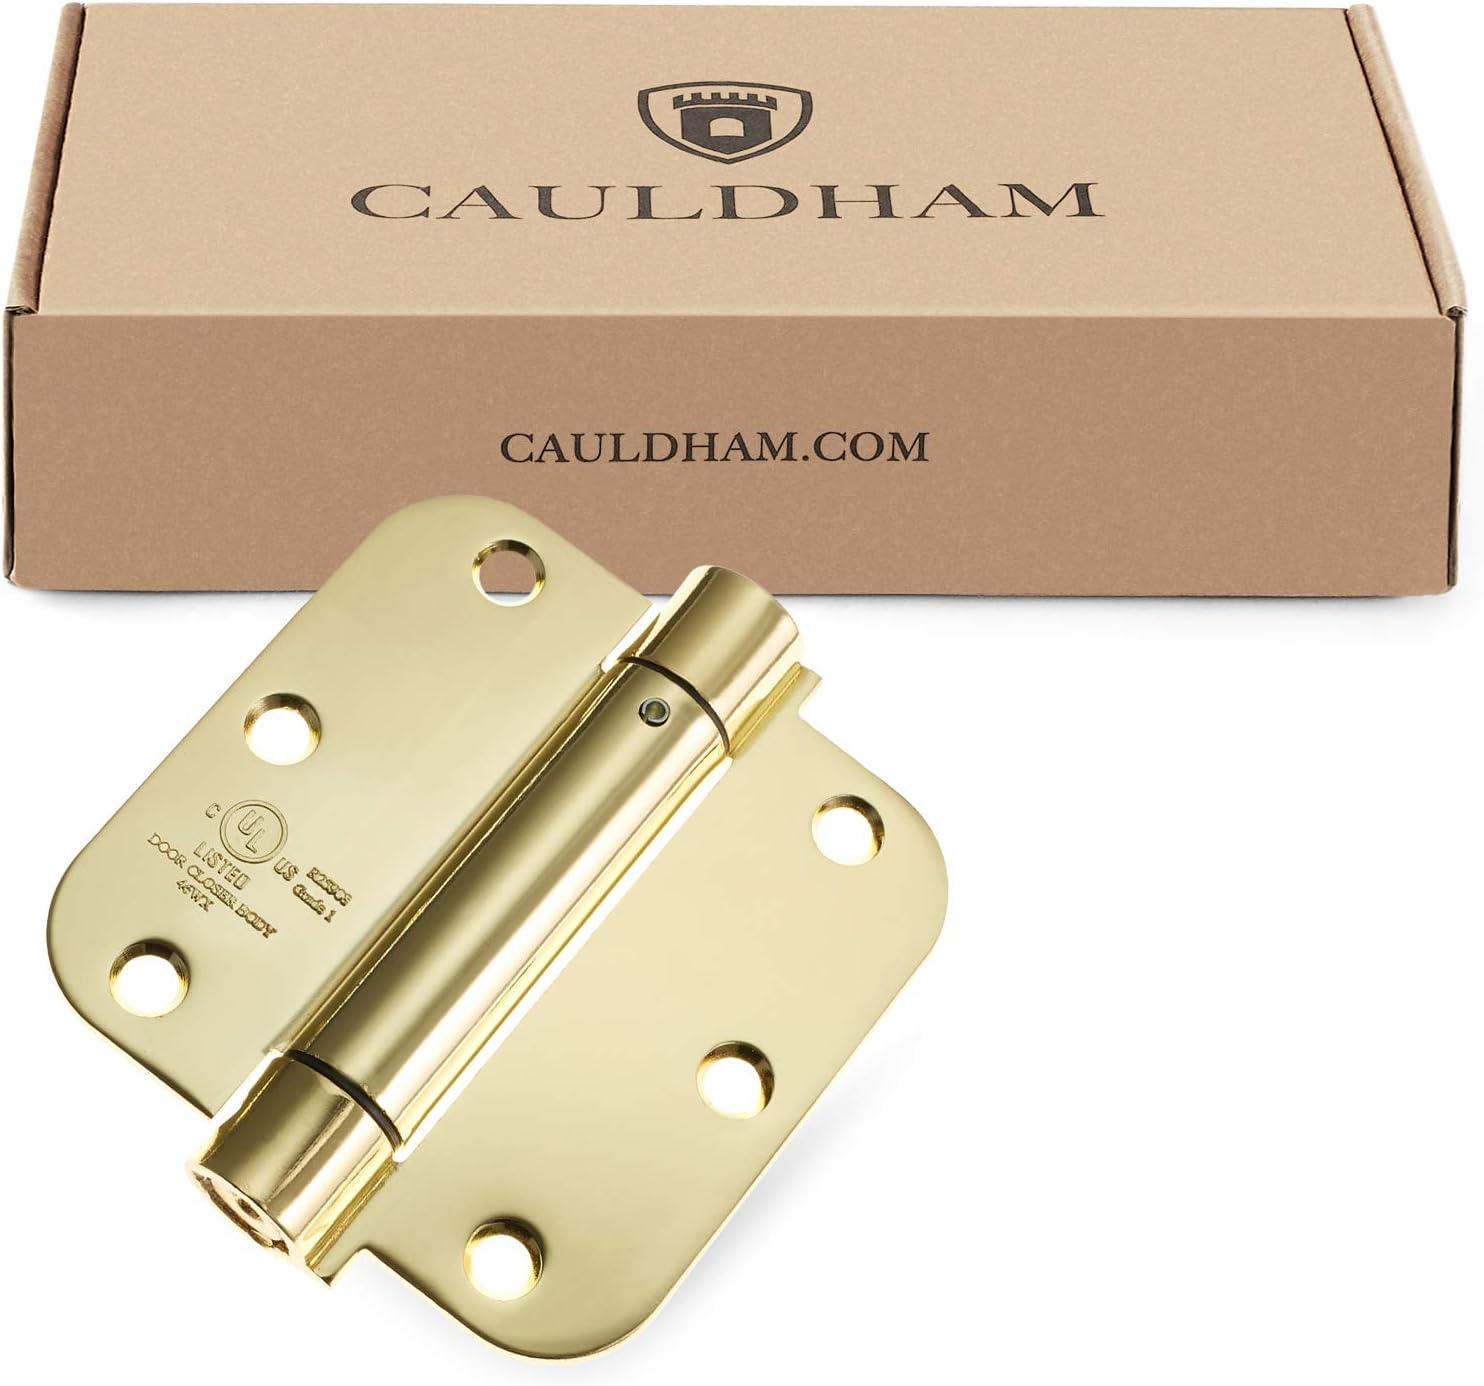 UL Listed Cauldham Heavy-Duty 3-1//2 Self-Closing Spring Door Hinge with 5//8 Radius Corners Brass 2 Pack